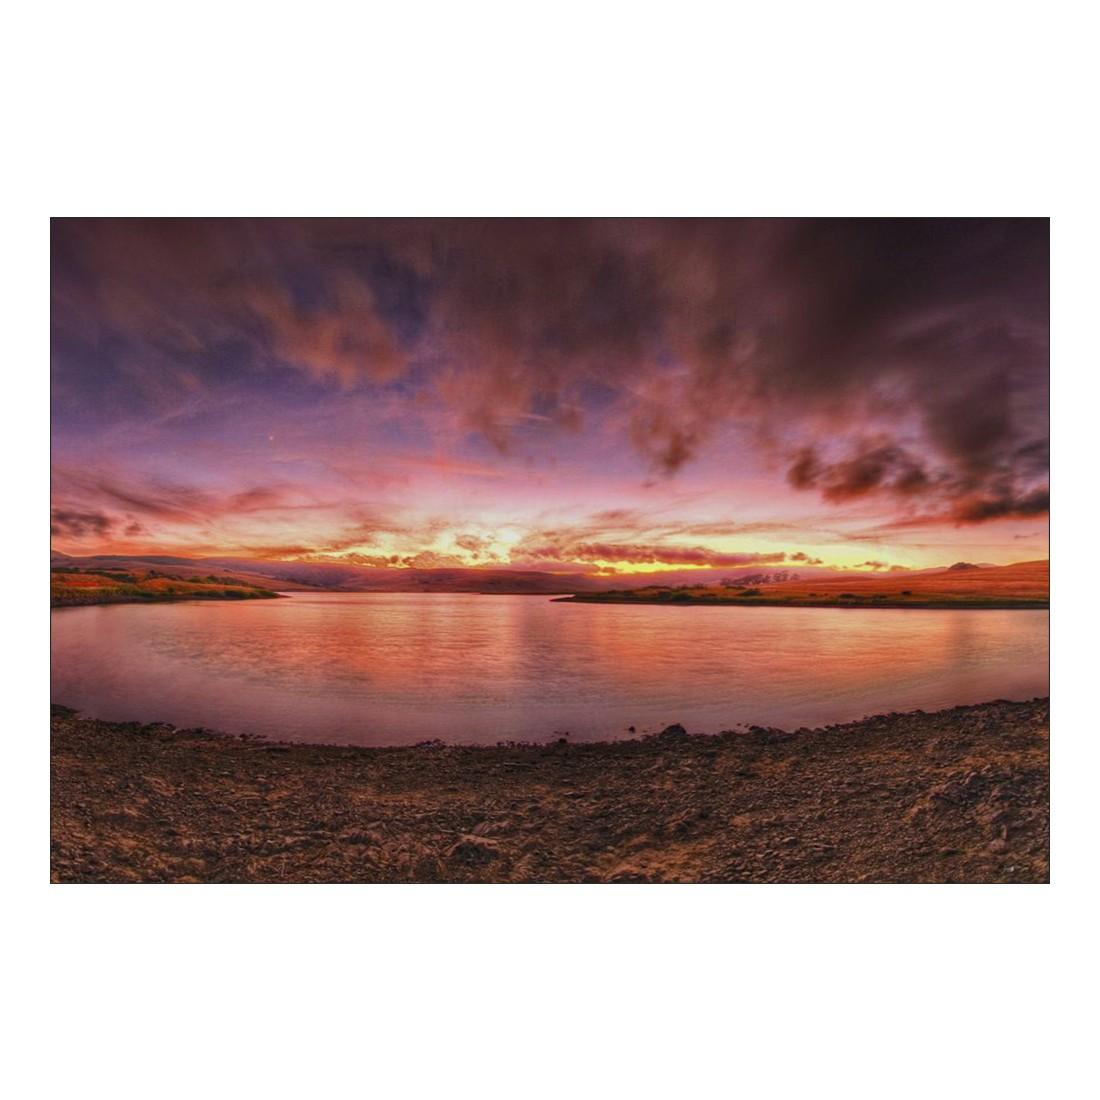 Acrylglasbild Orange Lake – Abmessung 30×20 cm, Gallery of Innovative Art bestellen